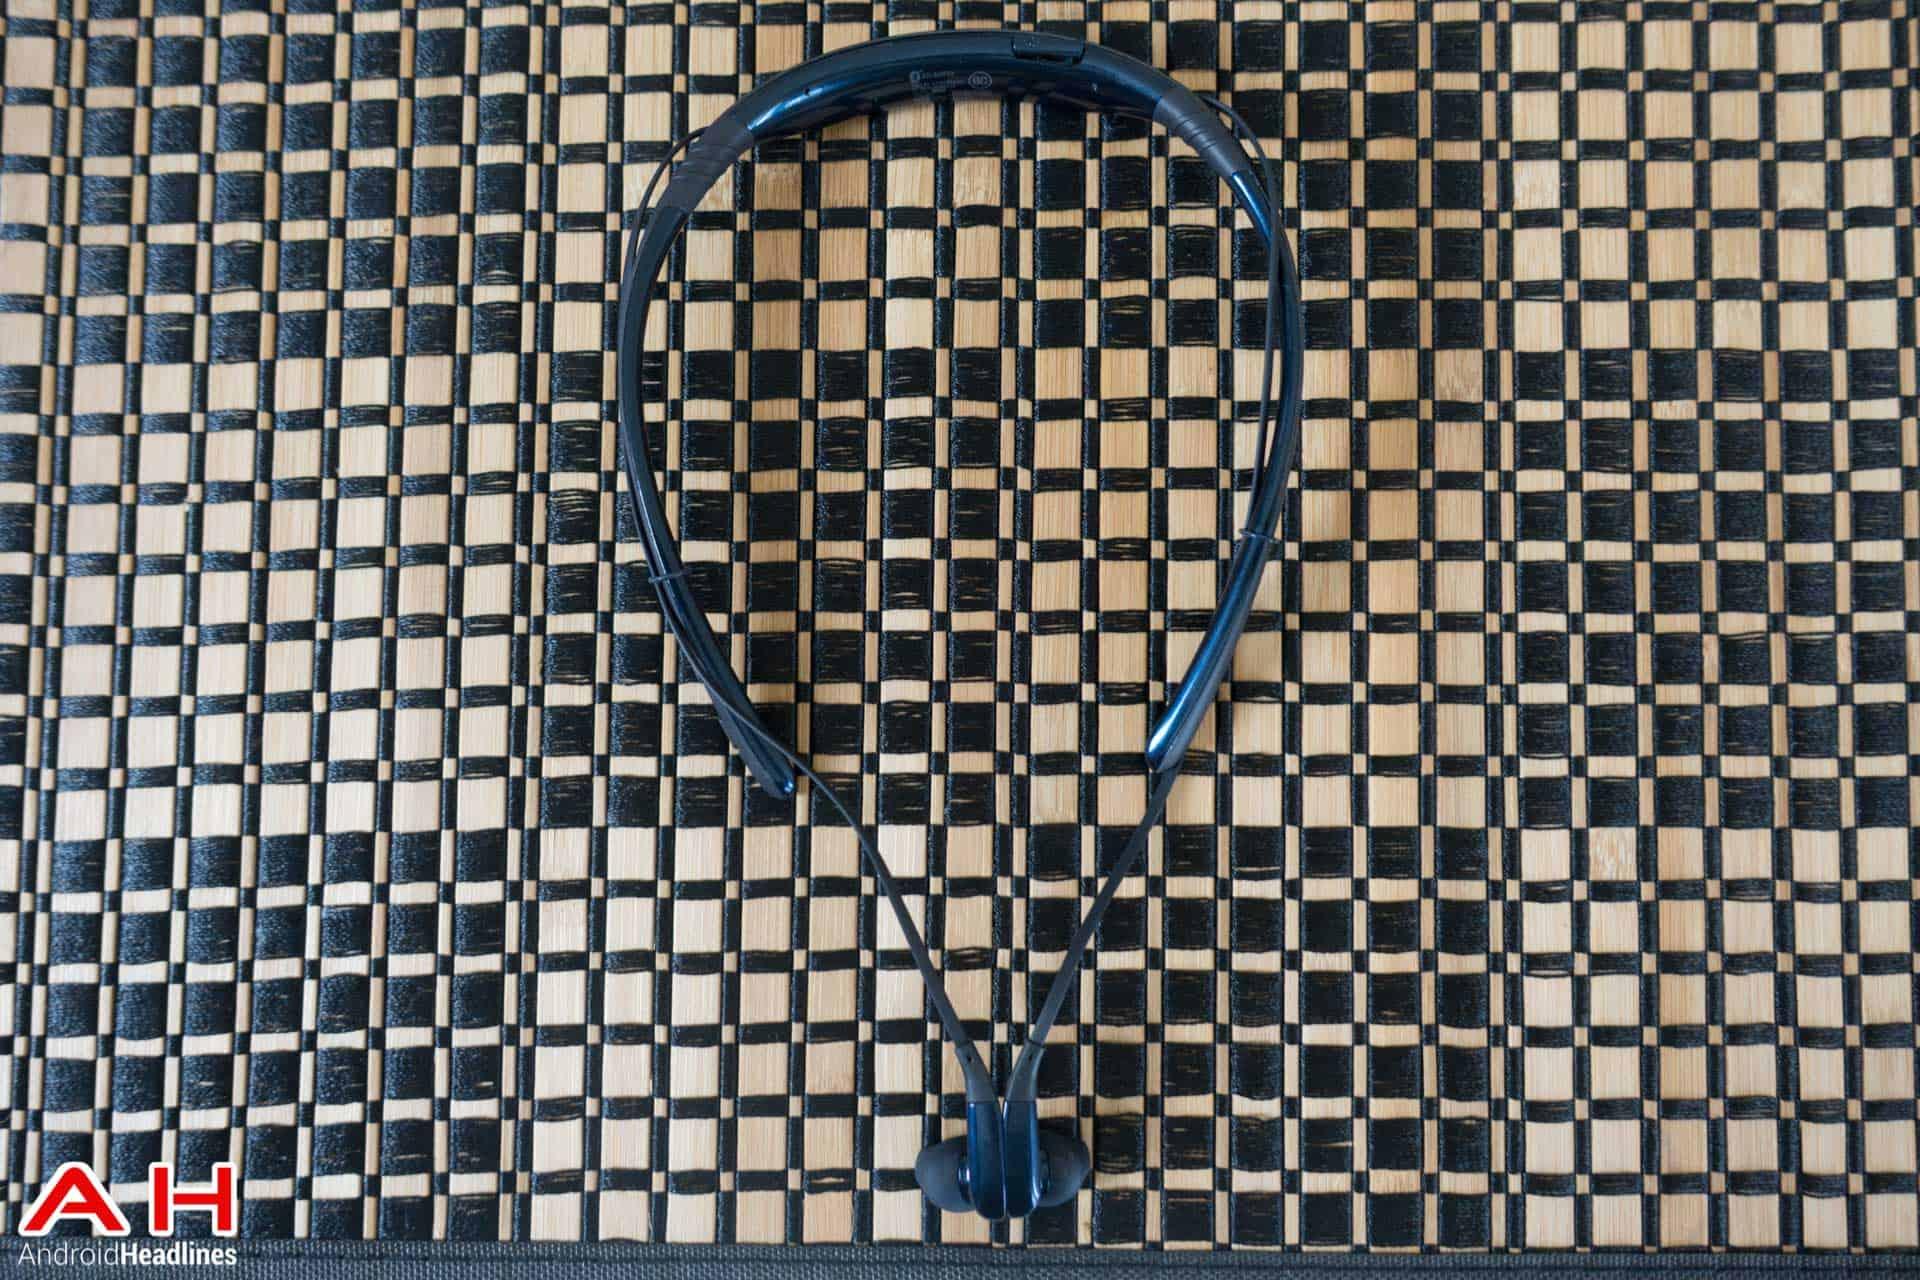 Samsung Level U Wireless Headphones AH 6